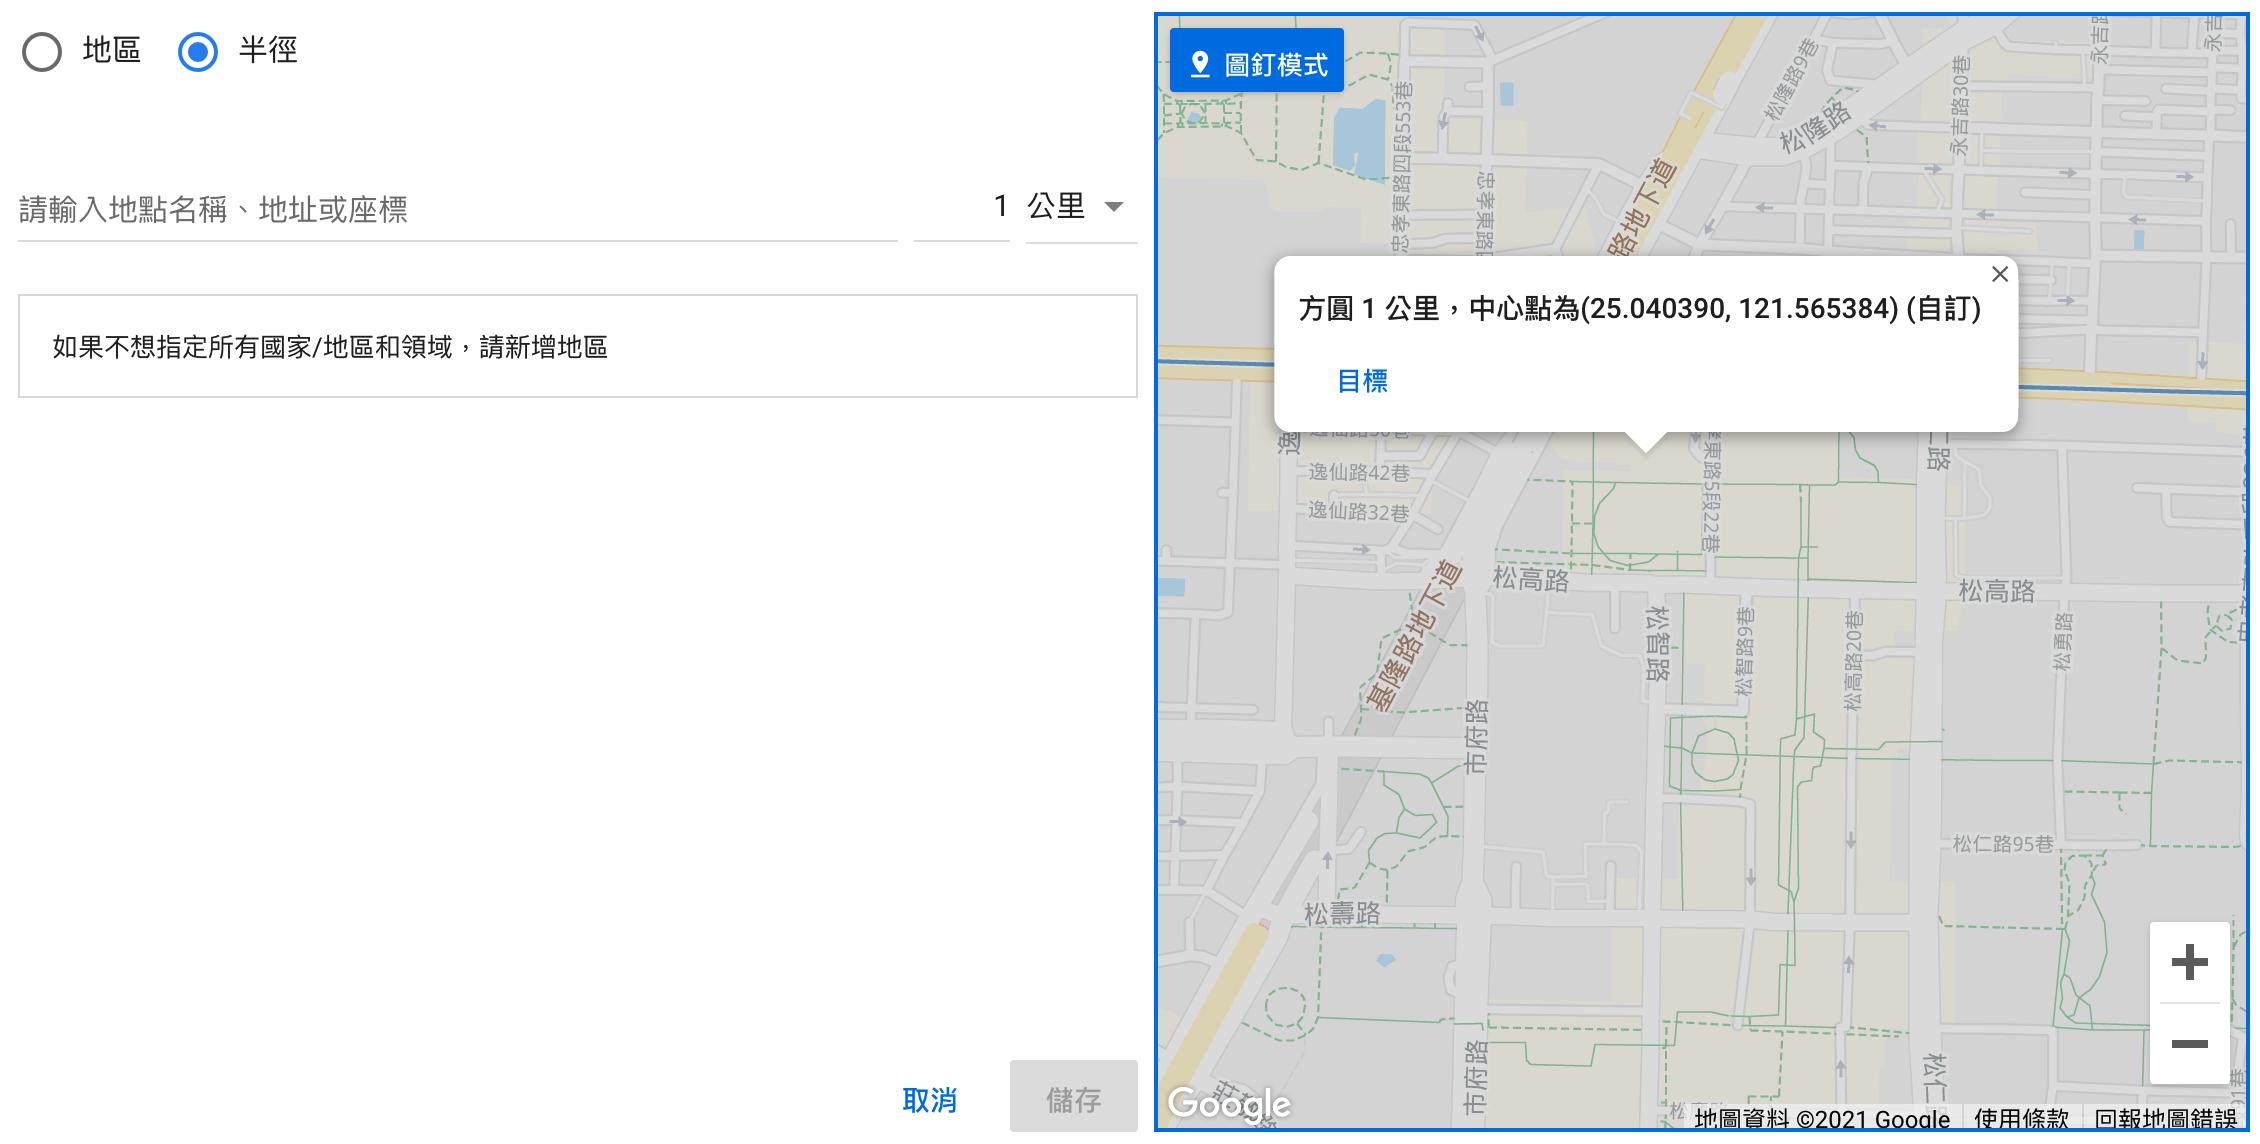 Google 廣告 地理定位受眾設定